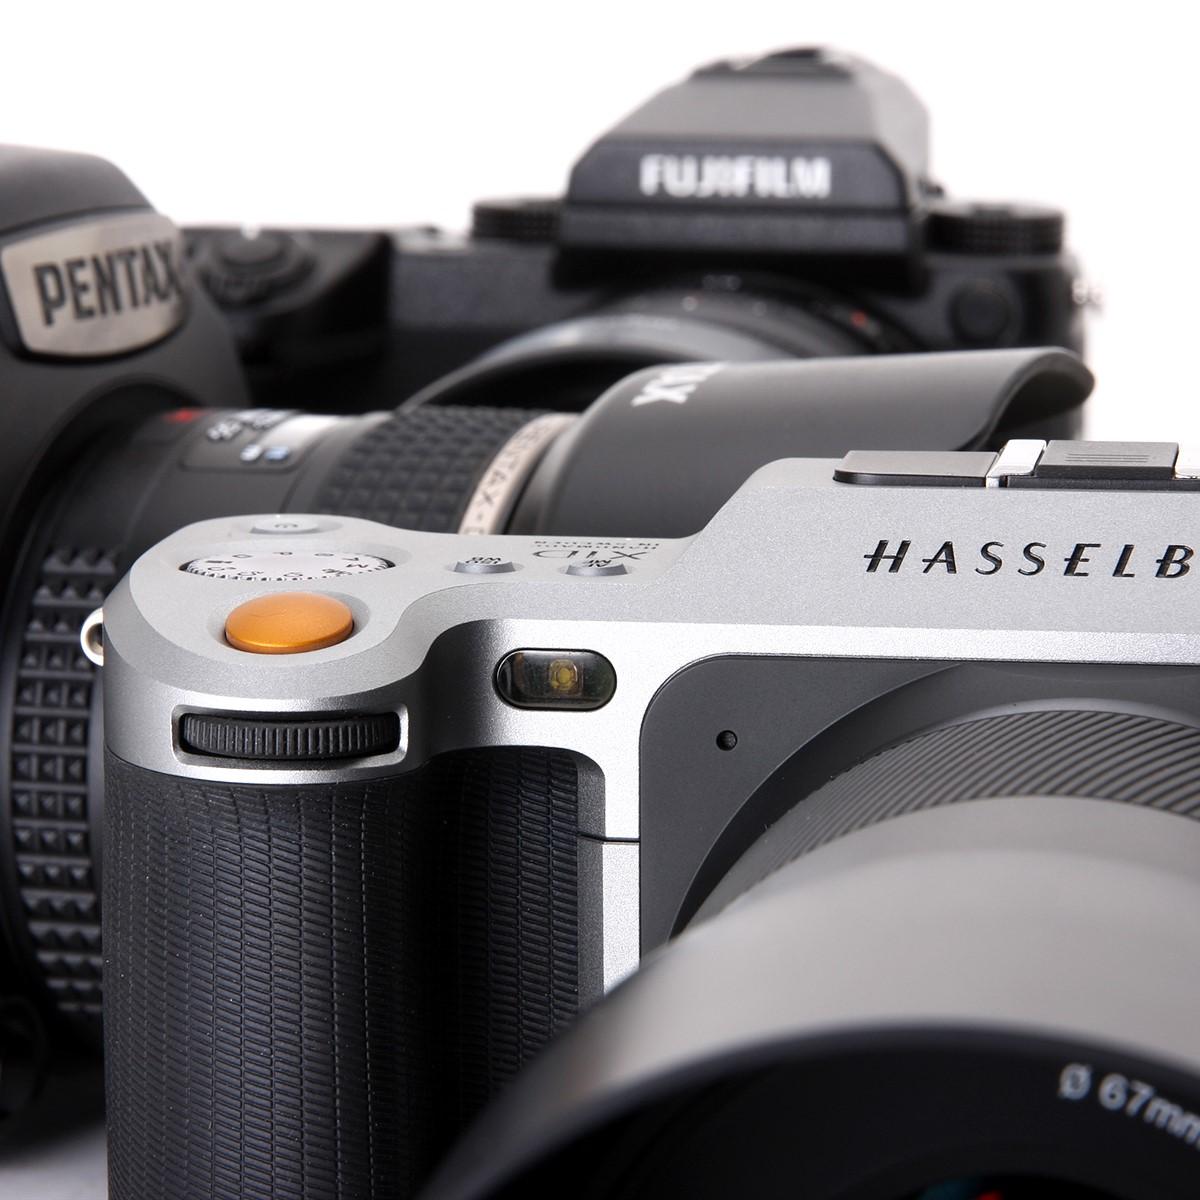 Fujifilm Gfx 50s Vs Pentax 645z Hasselblad X1d Digital Amp Gauge Wiring Diagram Http Wwwebaycom Itm Ac300v100abluelcd Photography Review